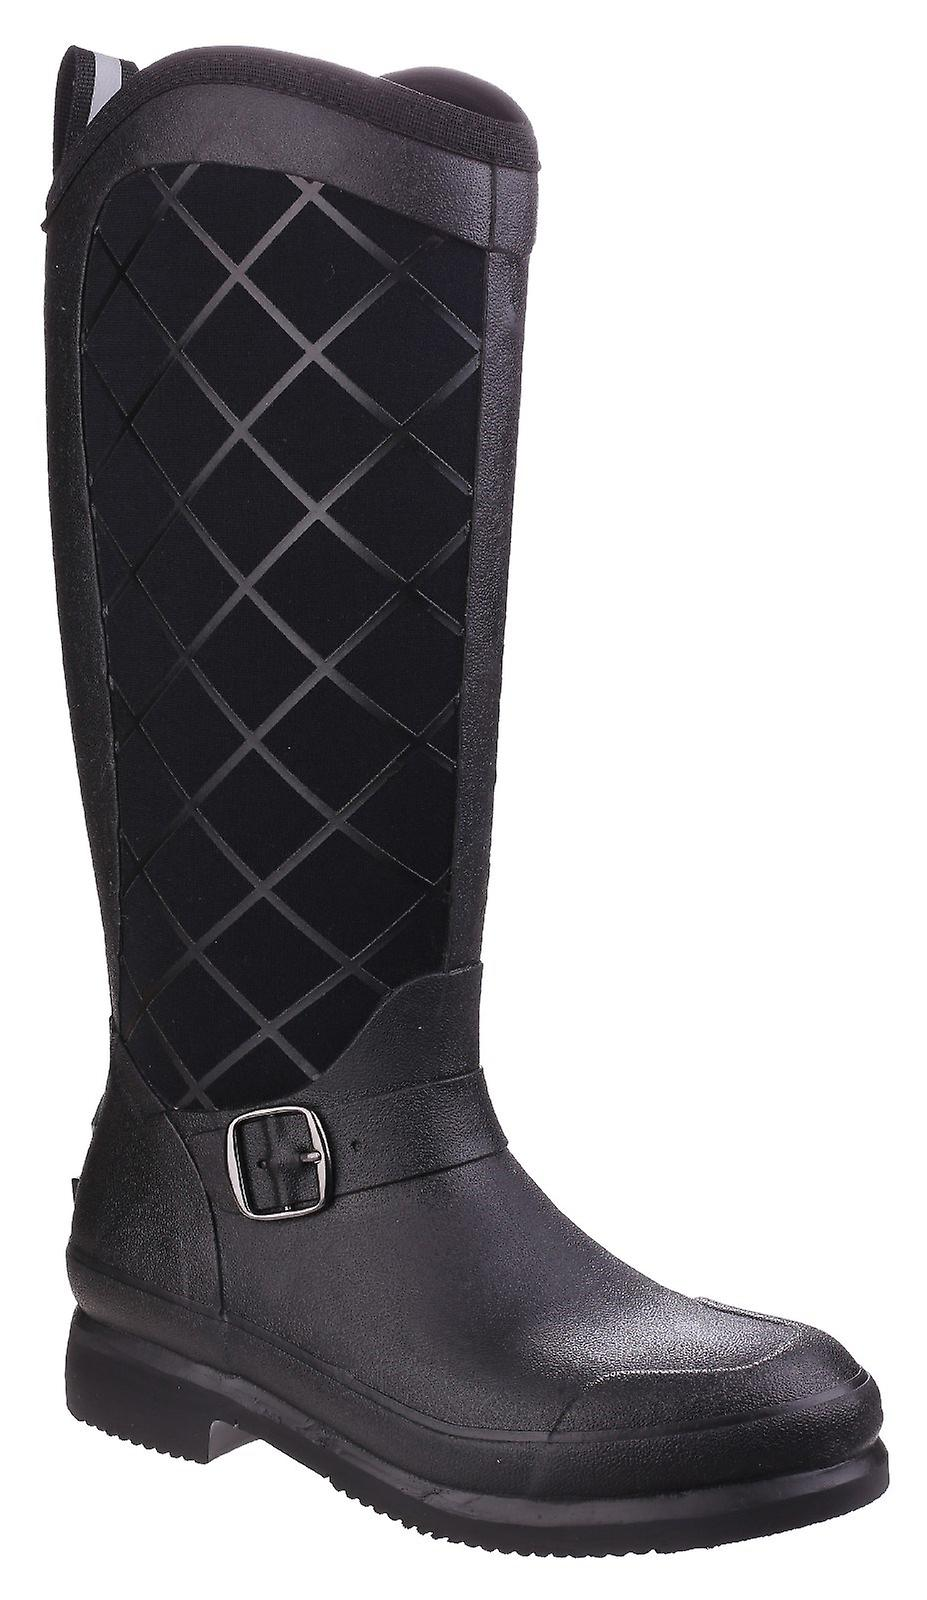 Muckboot Pacy II boots | Horze